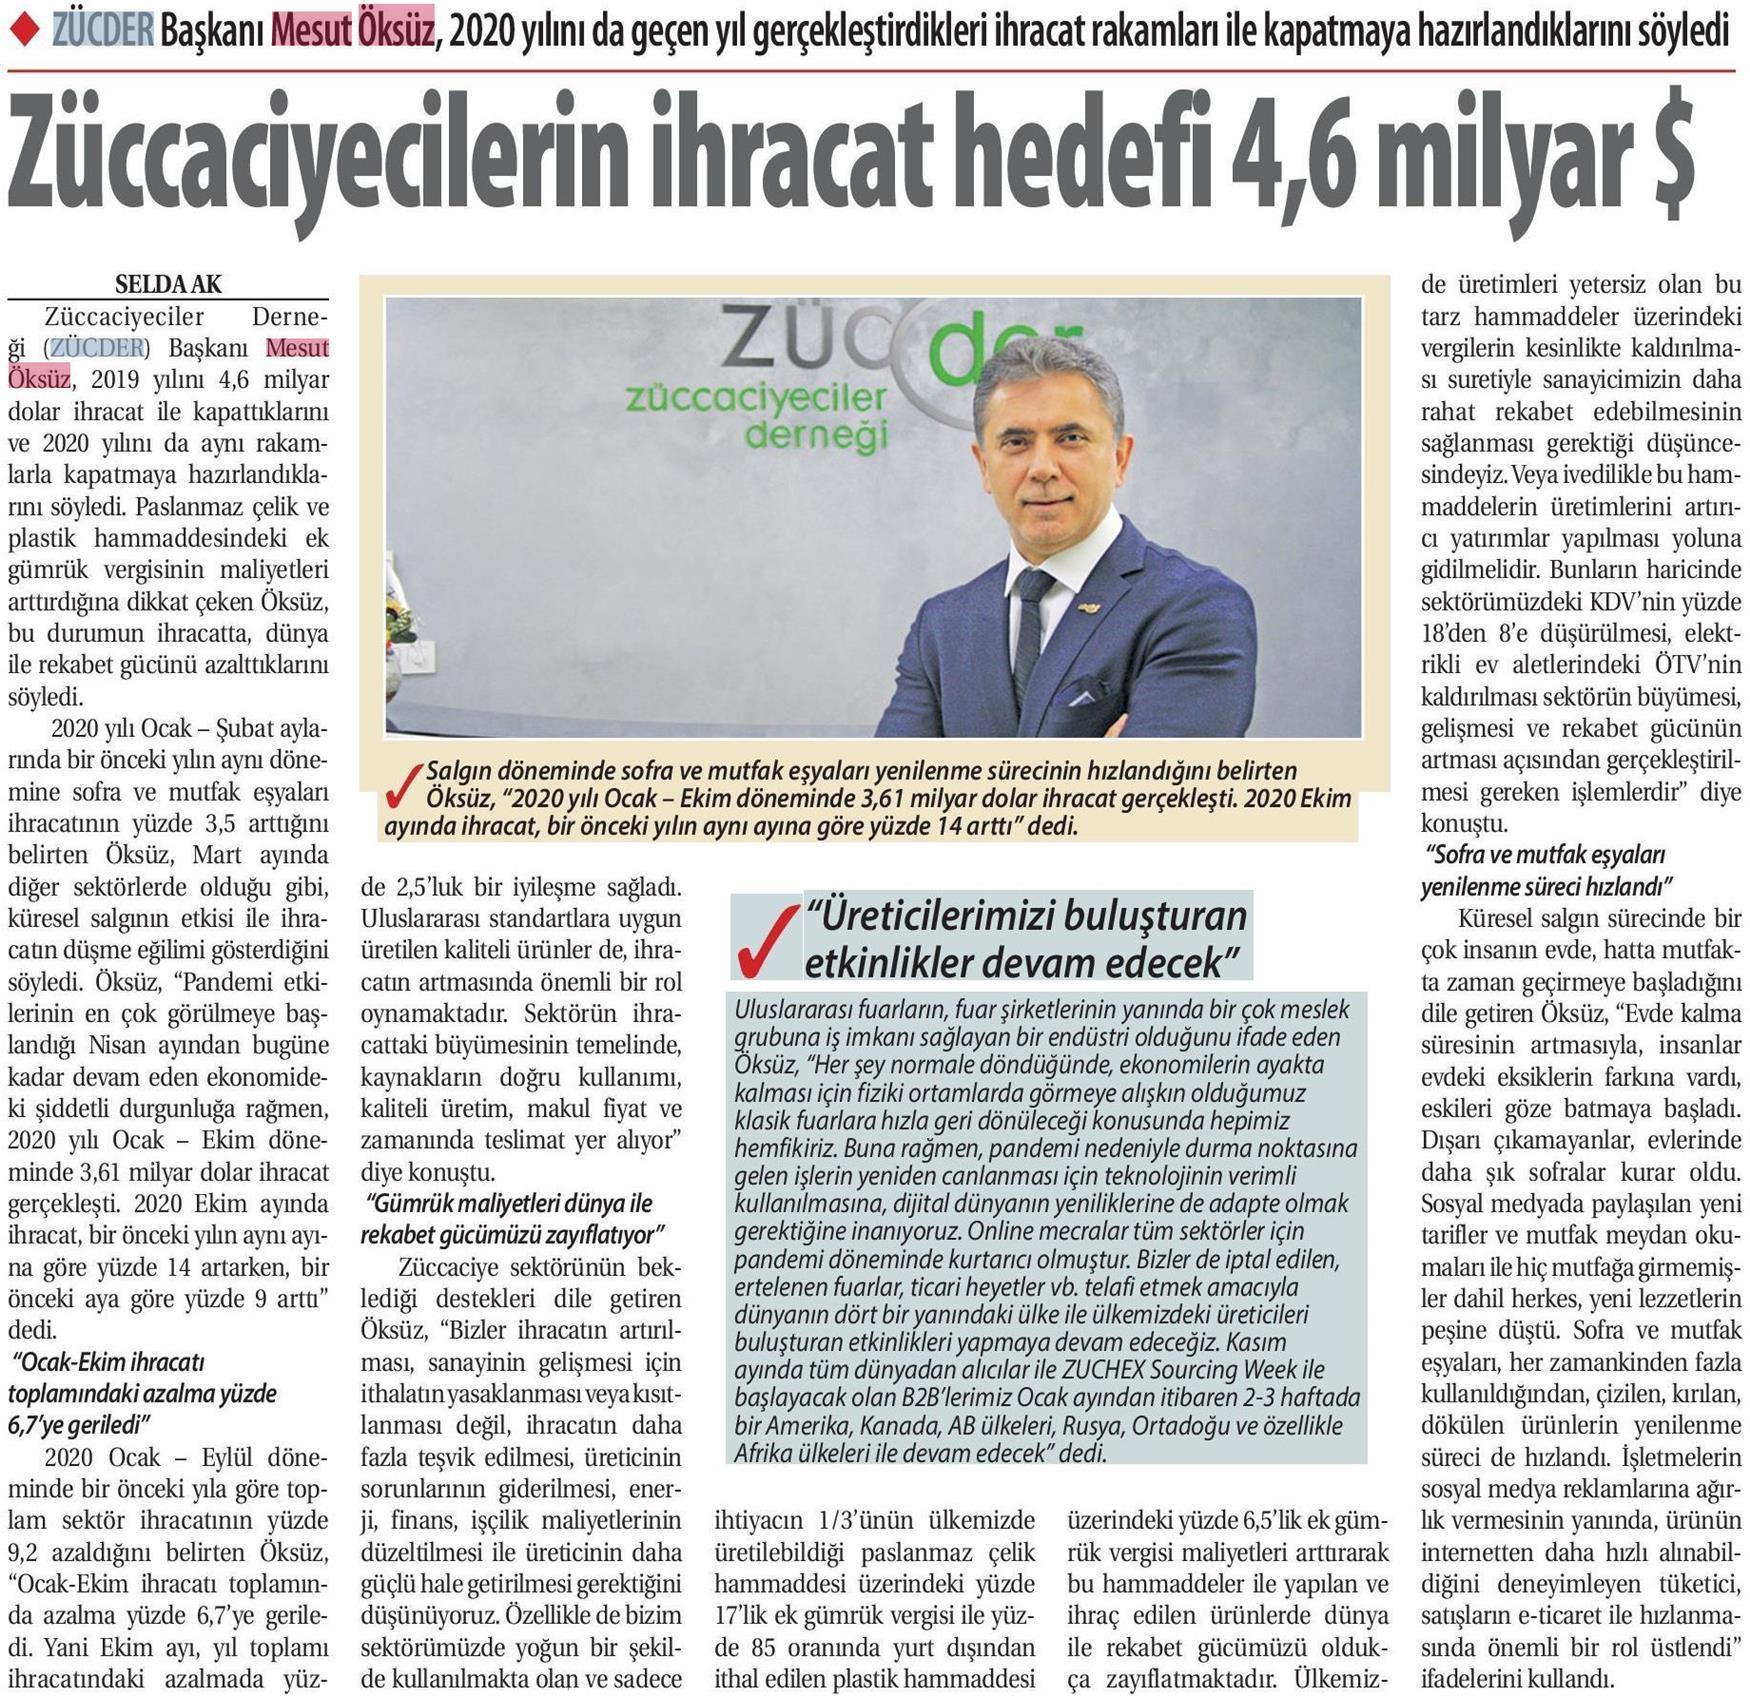 ZÜCDER TİCARET GAZETESİ 23.11.2020